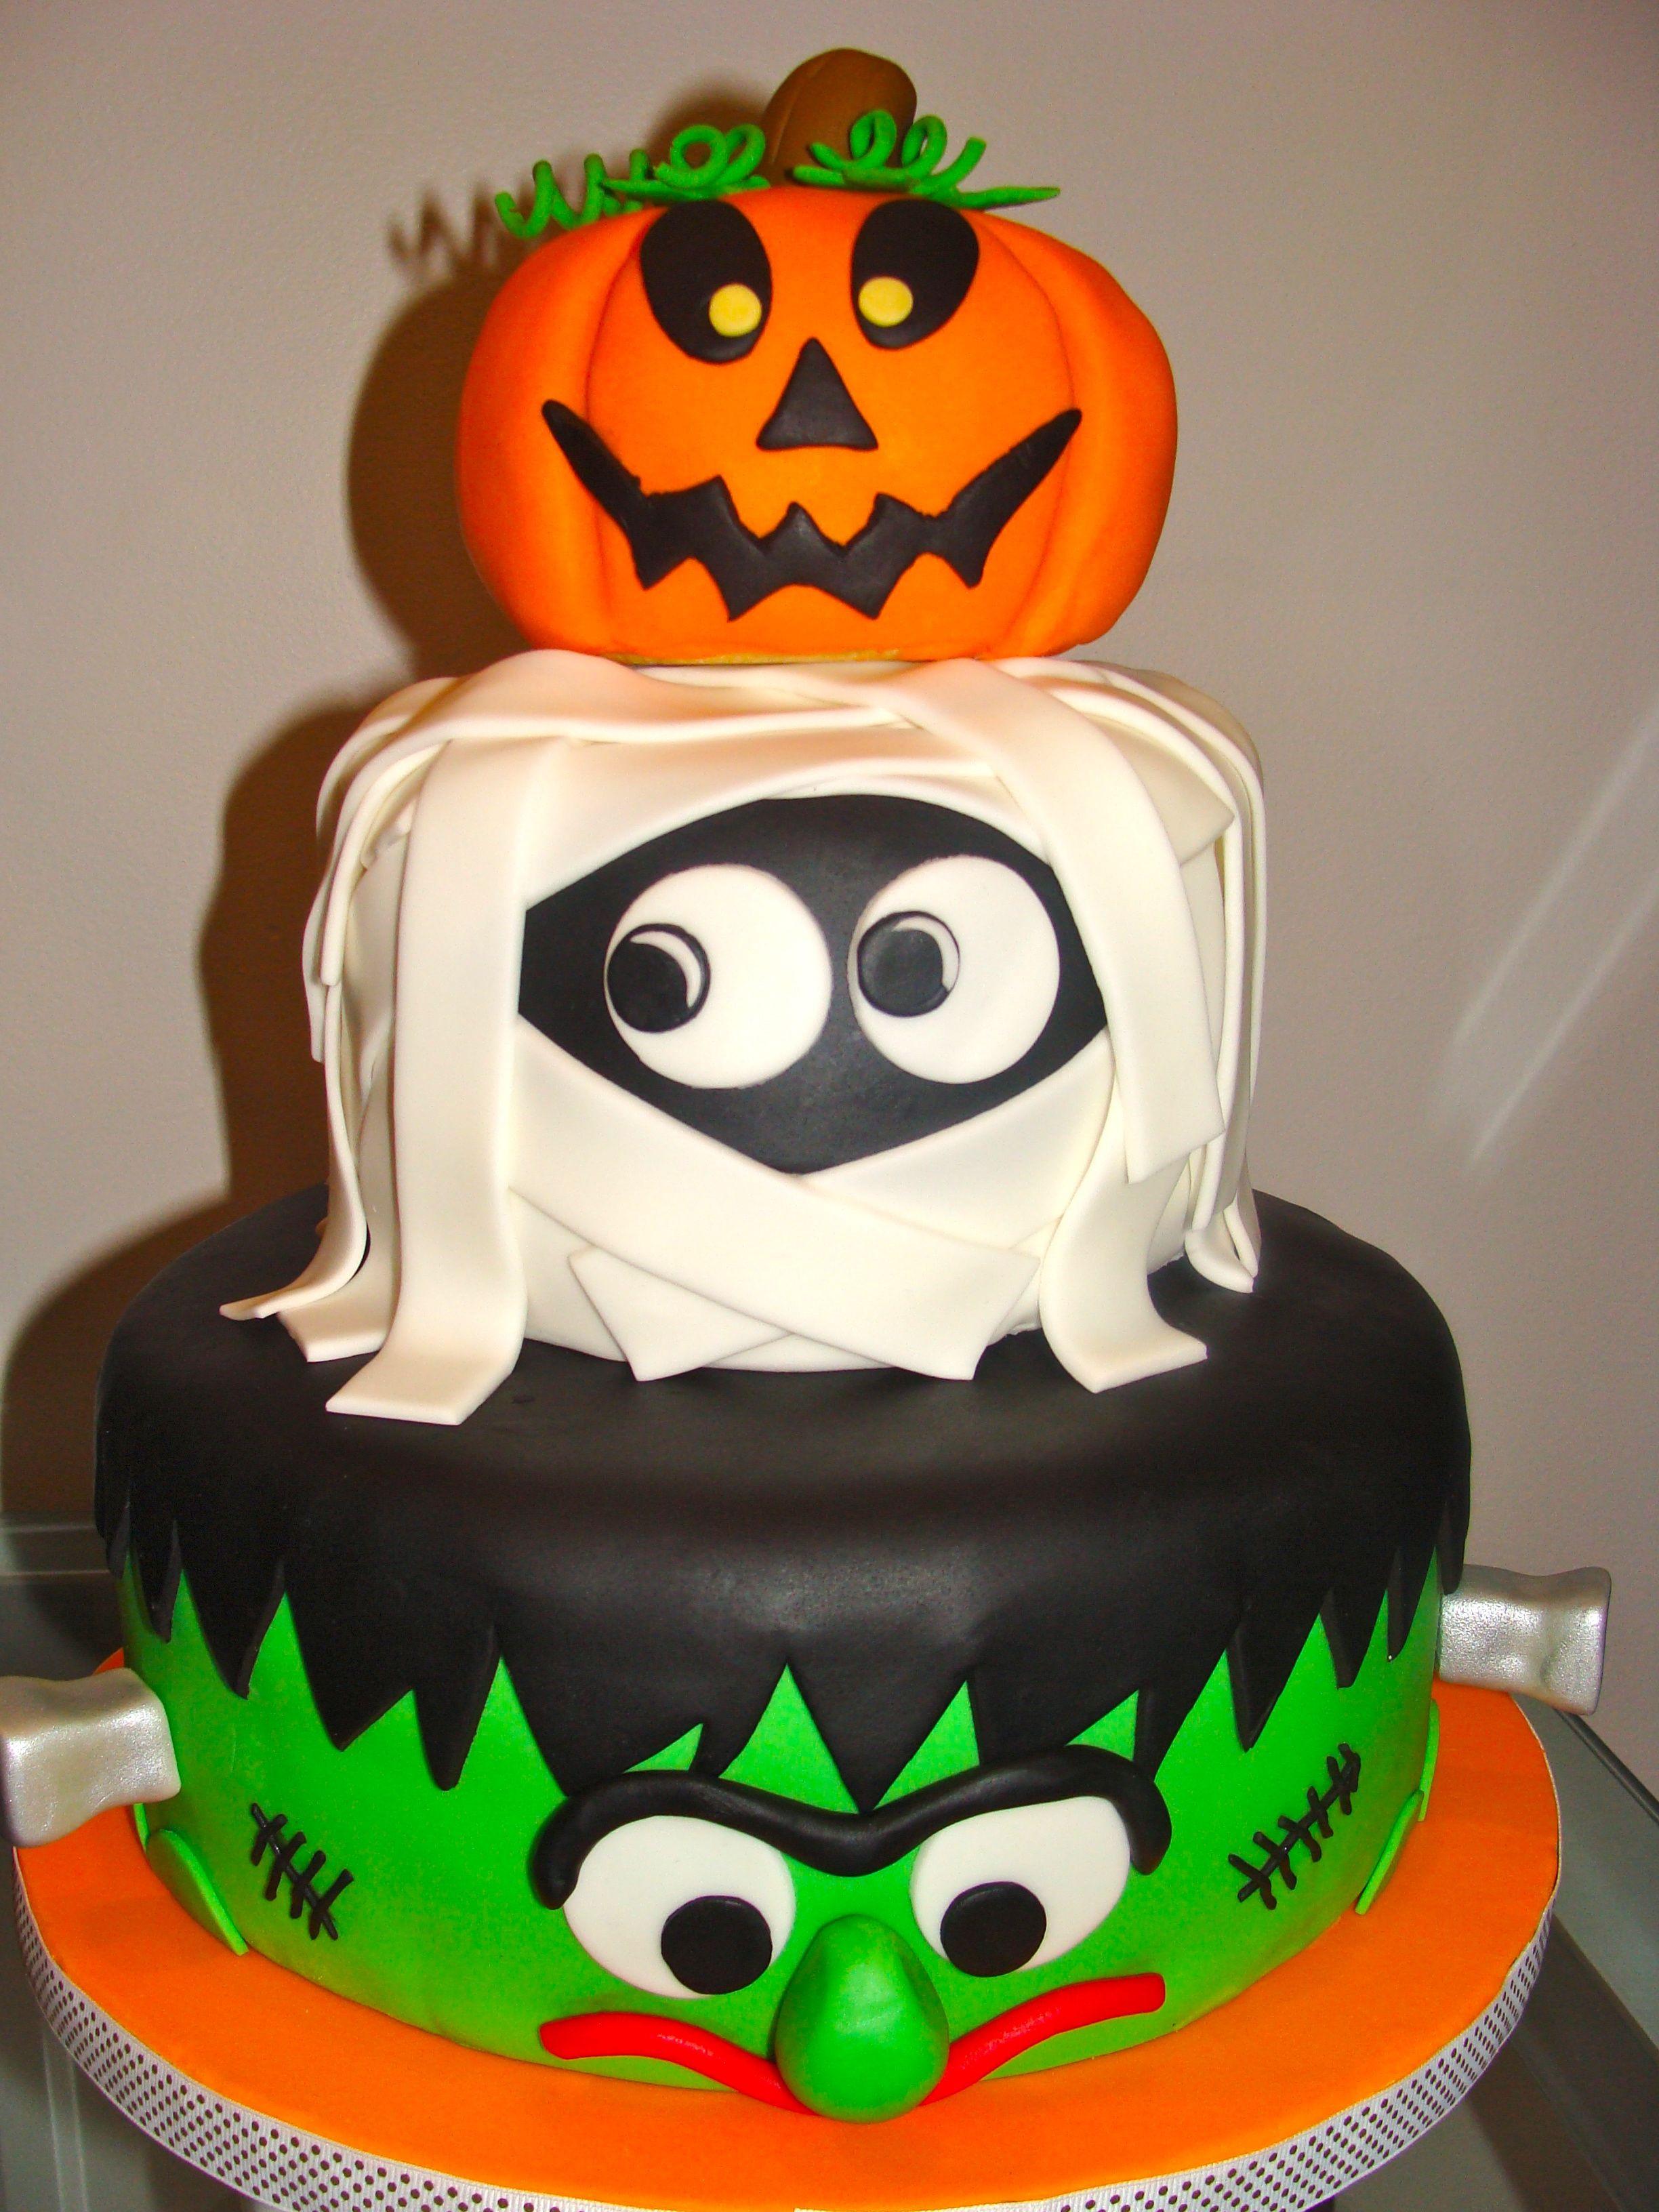 Halloween Birthday Cake Ideas  21 Amazing Halloween Cake Ideas Halloween cakes